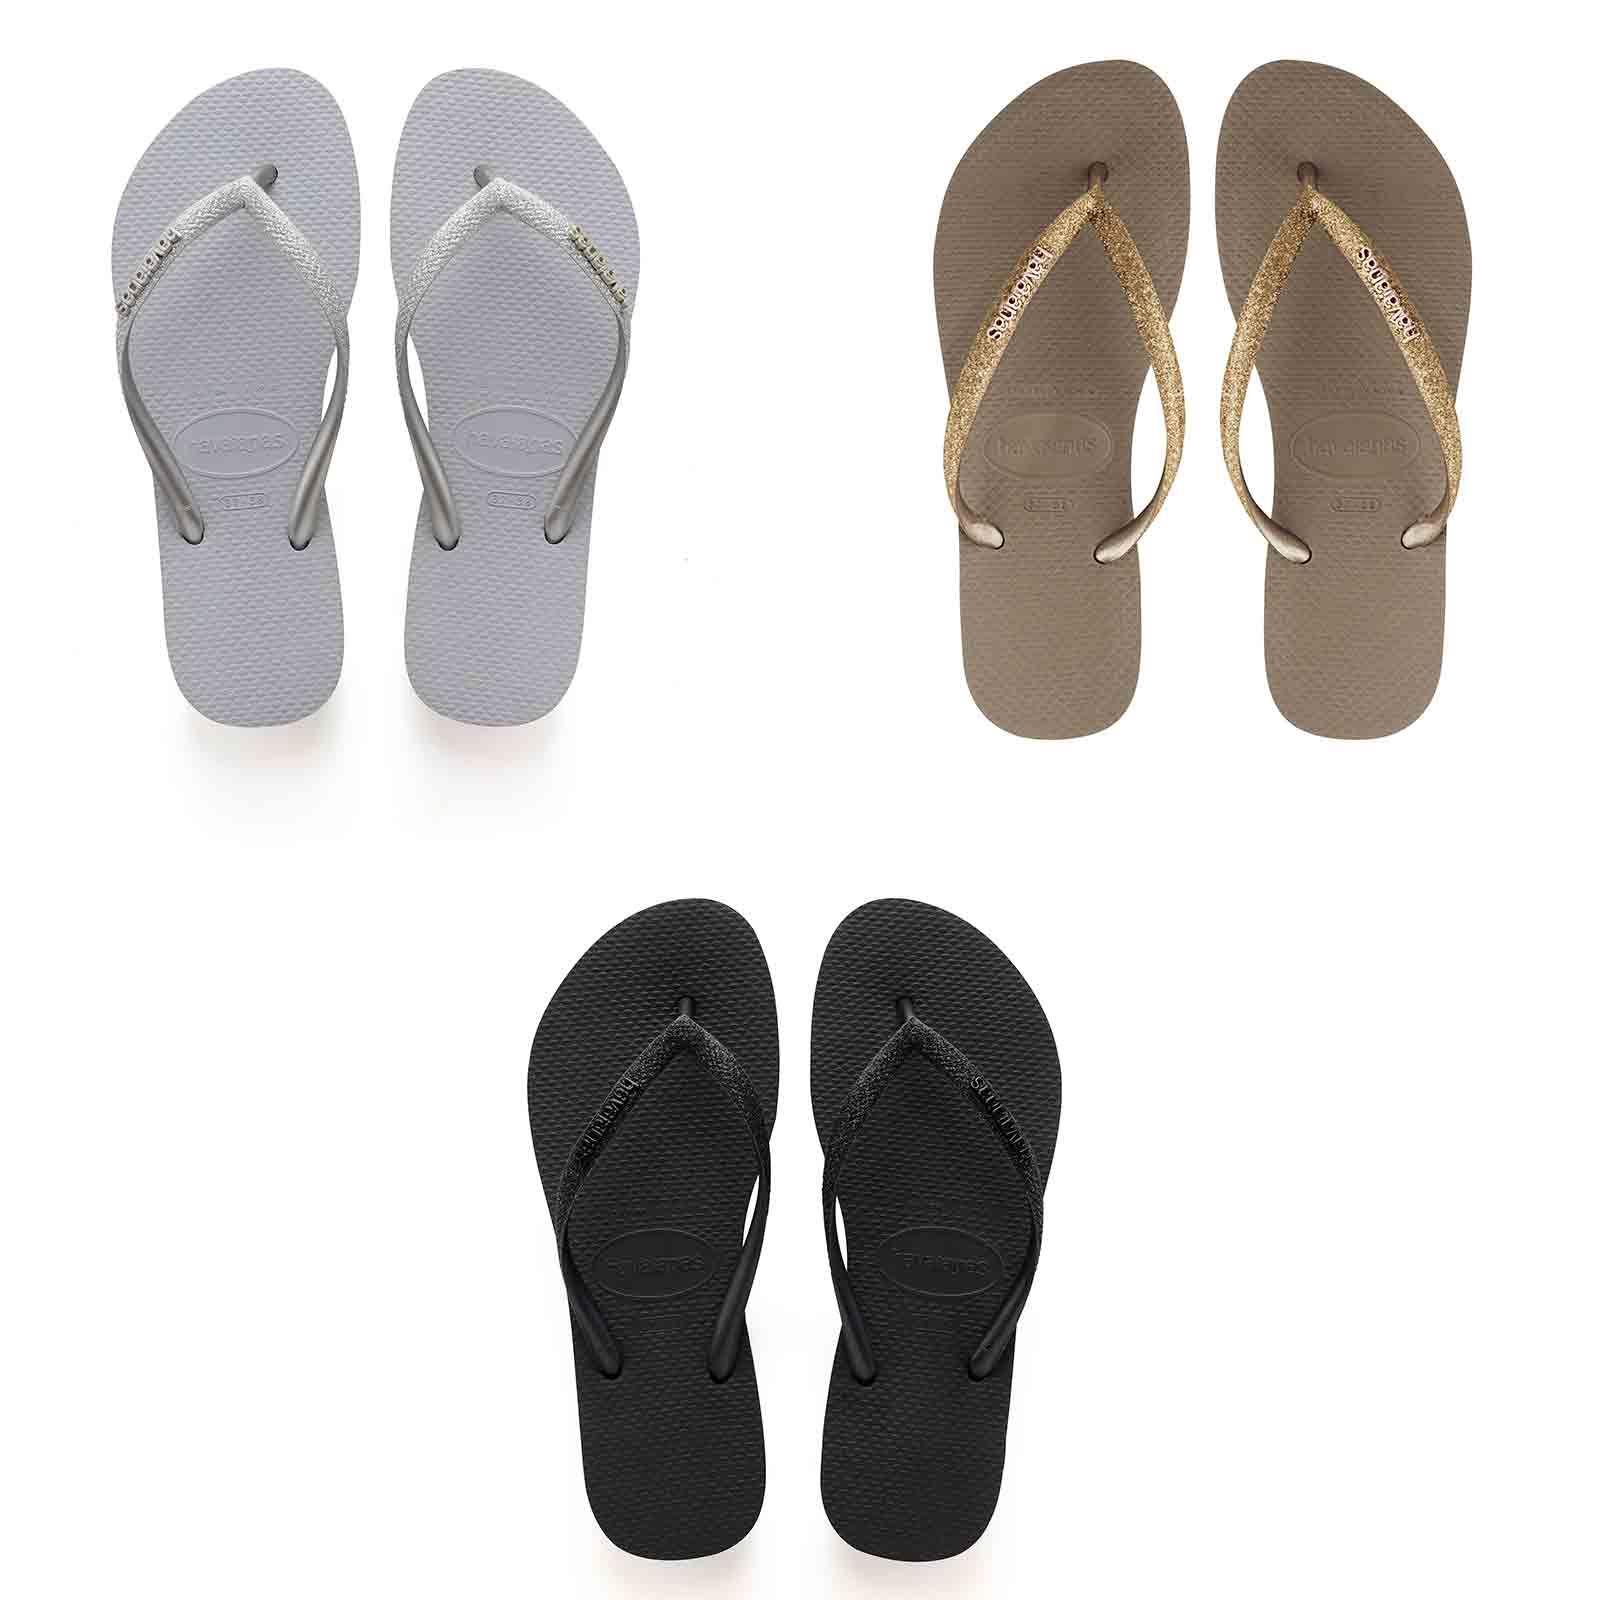 bd6bbe72ca5 Details about Havaianas Slim Glitter Strap Flip Flops Women Summer Beach  Pool Sandals Thongs